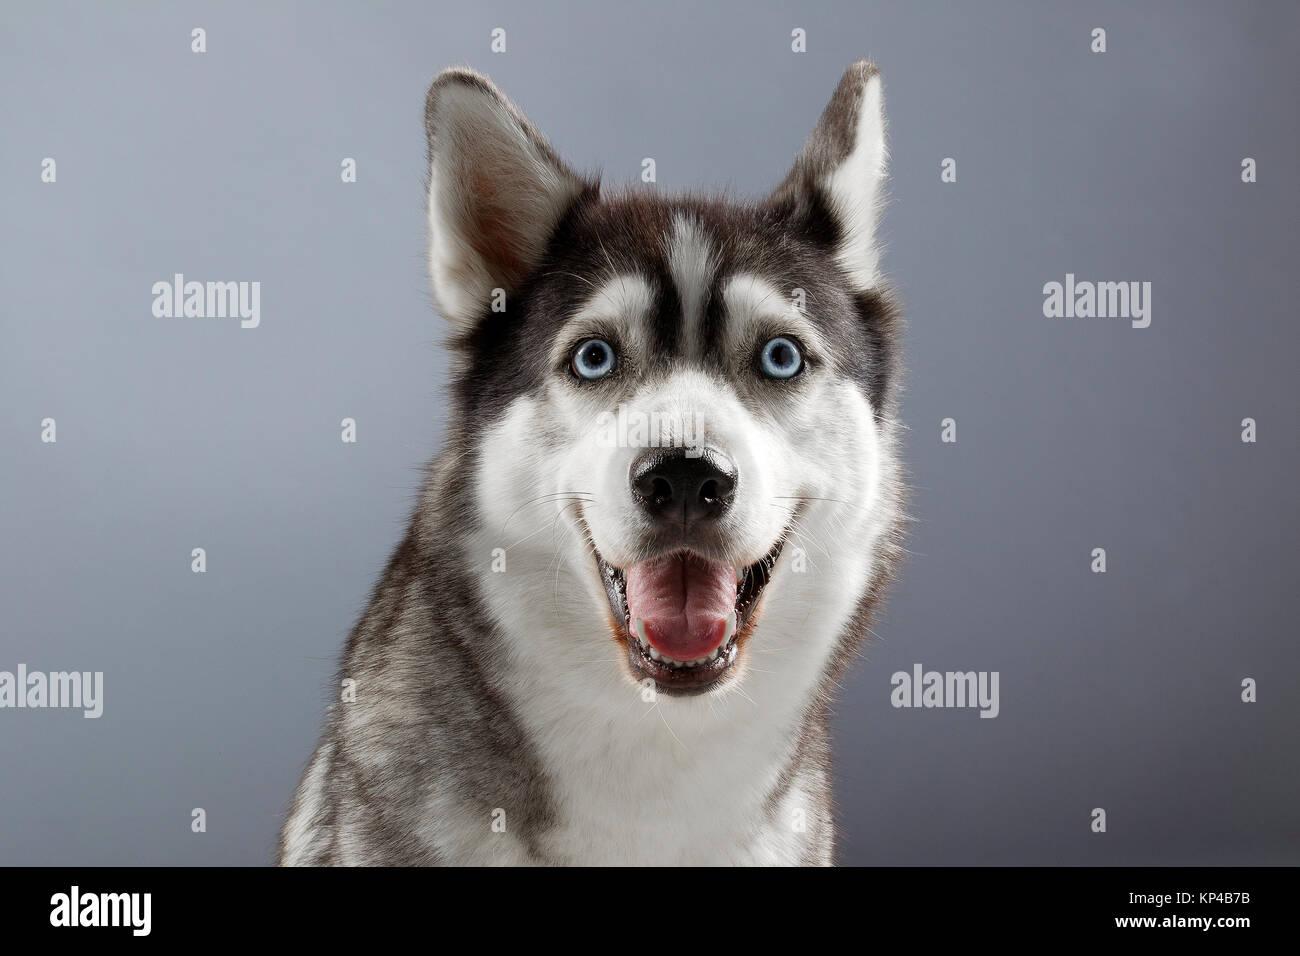 smiling husky in grey backgorund - Stock Image